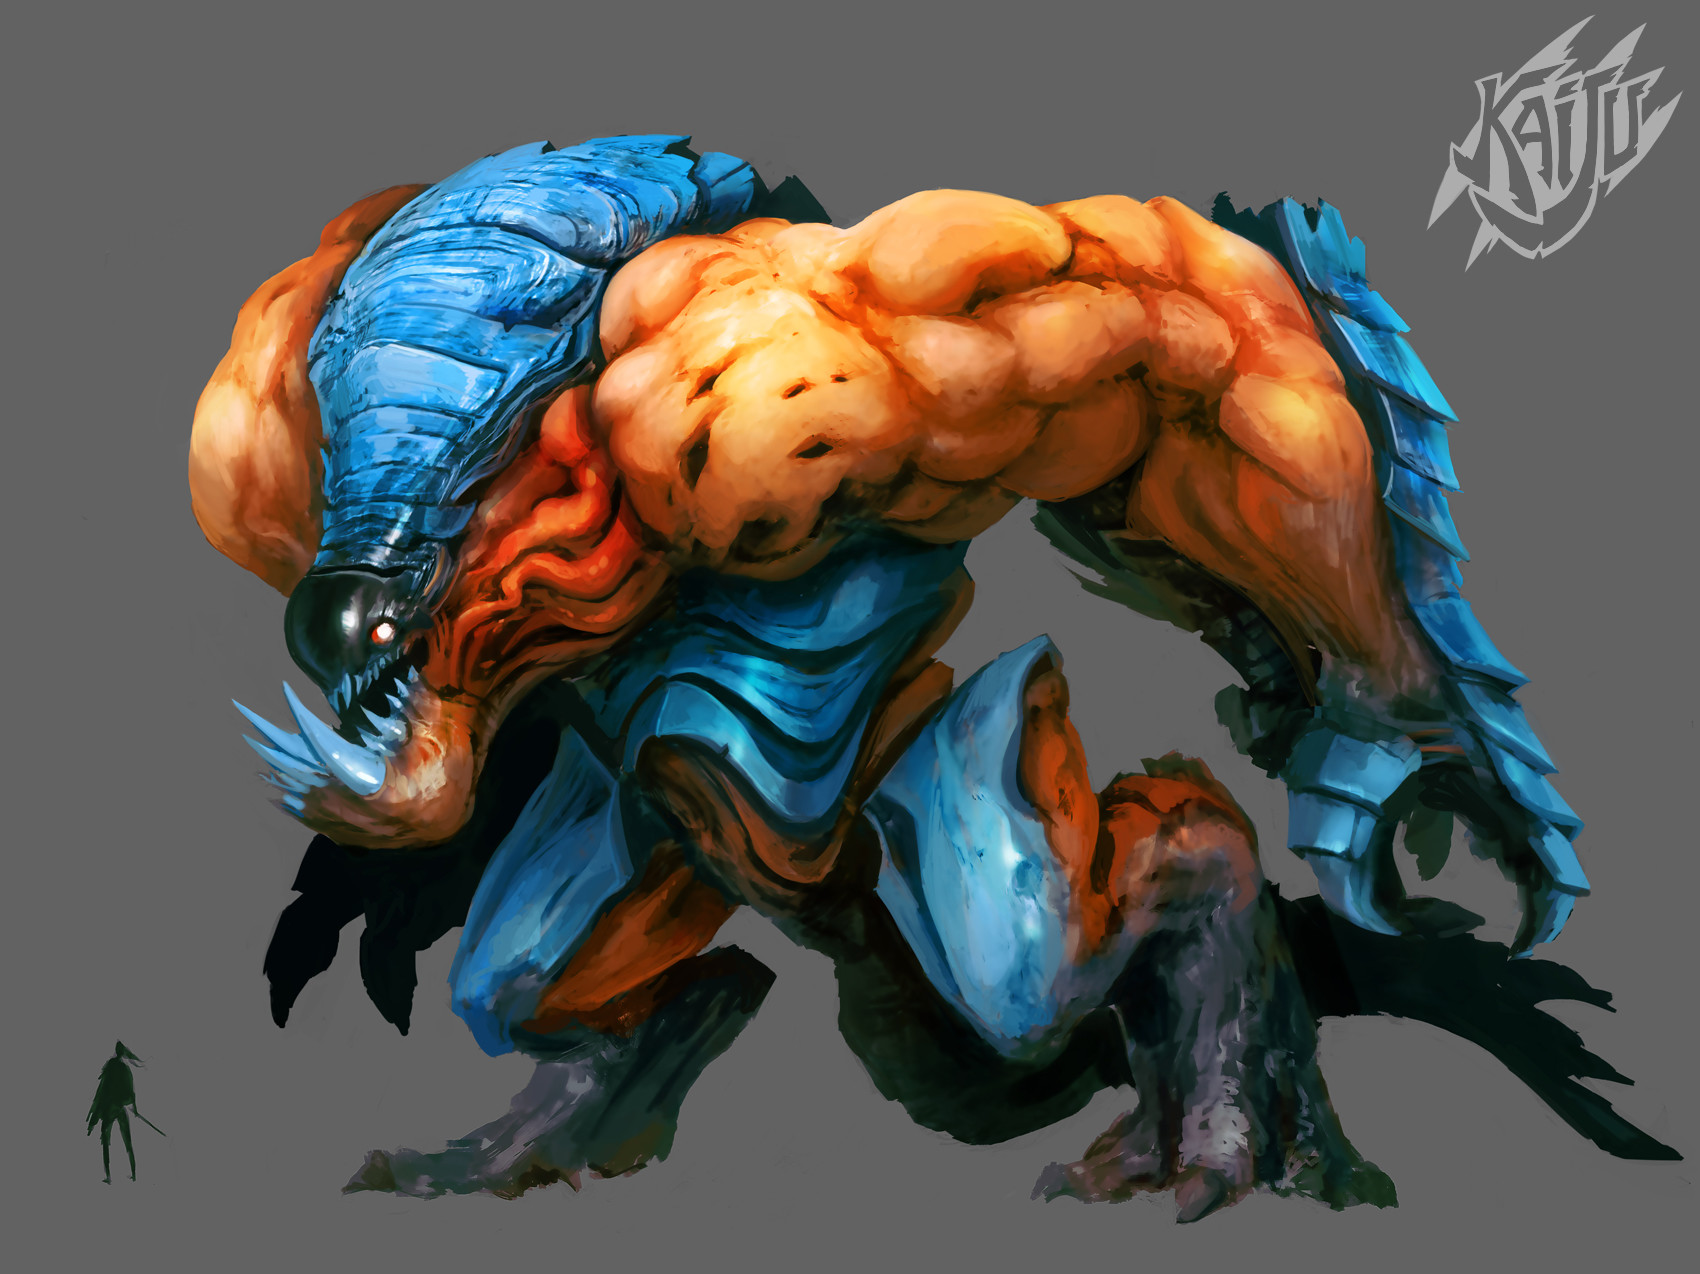 Alexandre chaudret kaijus creature predator06b